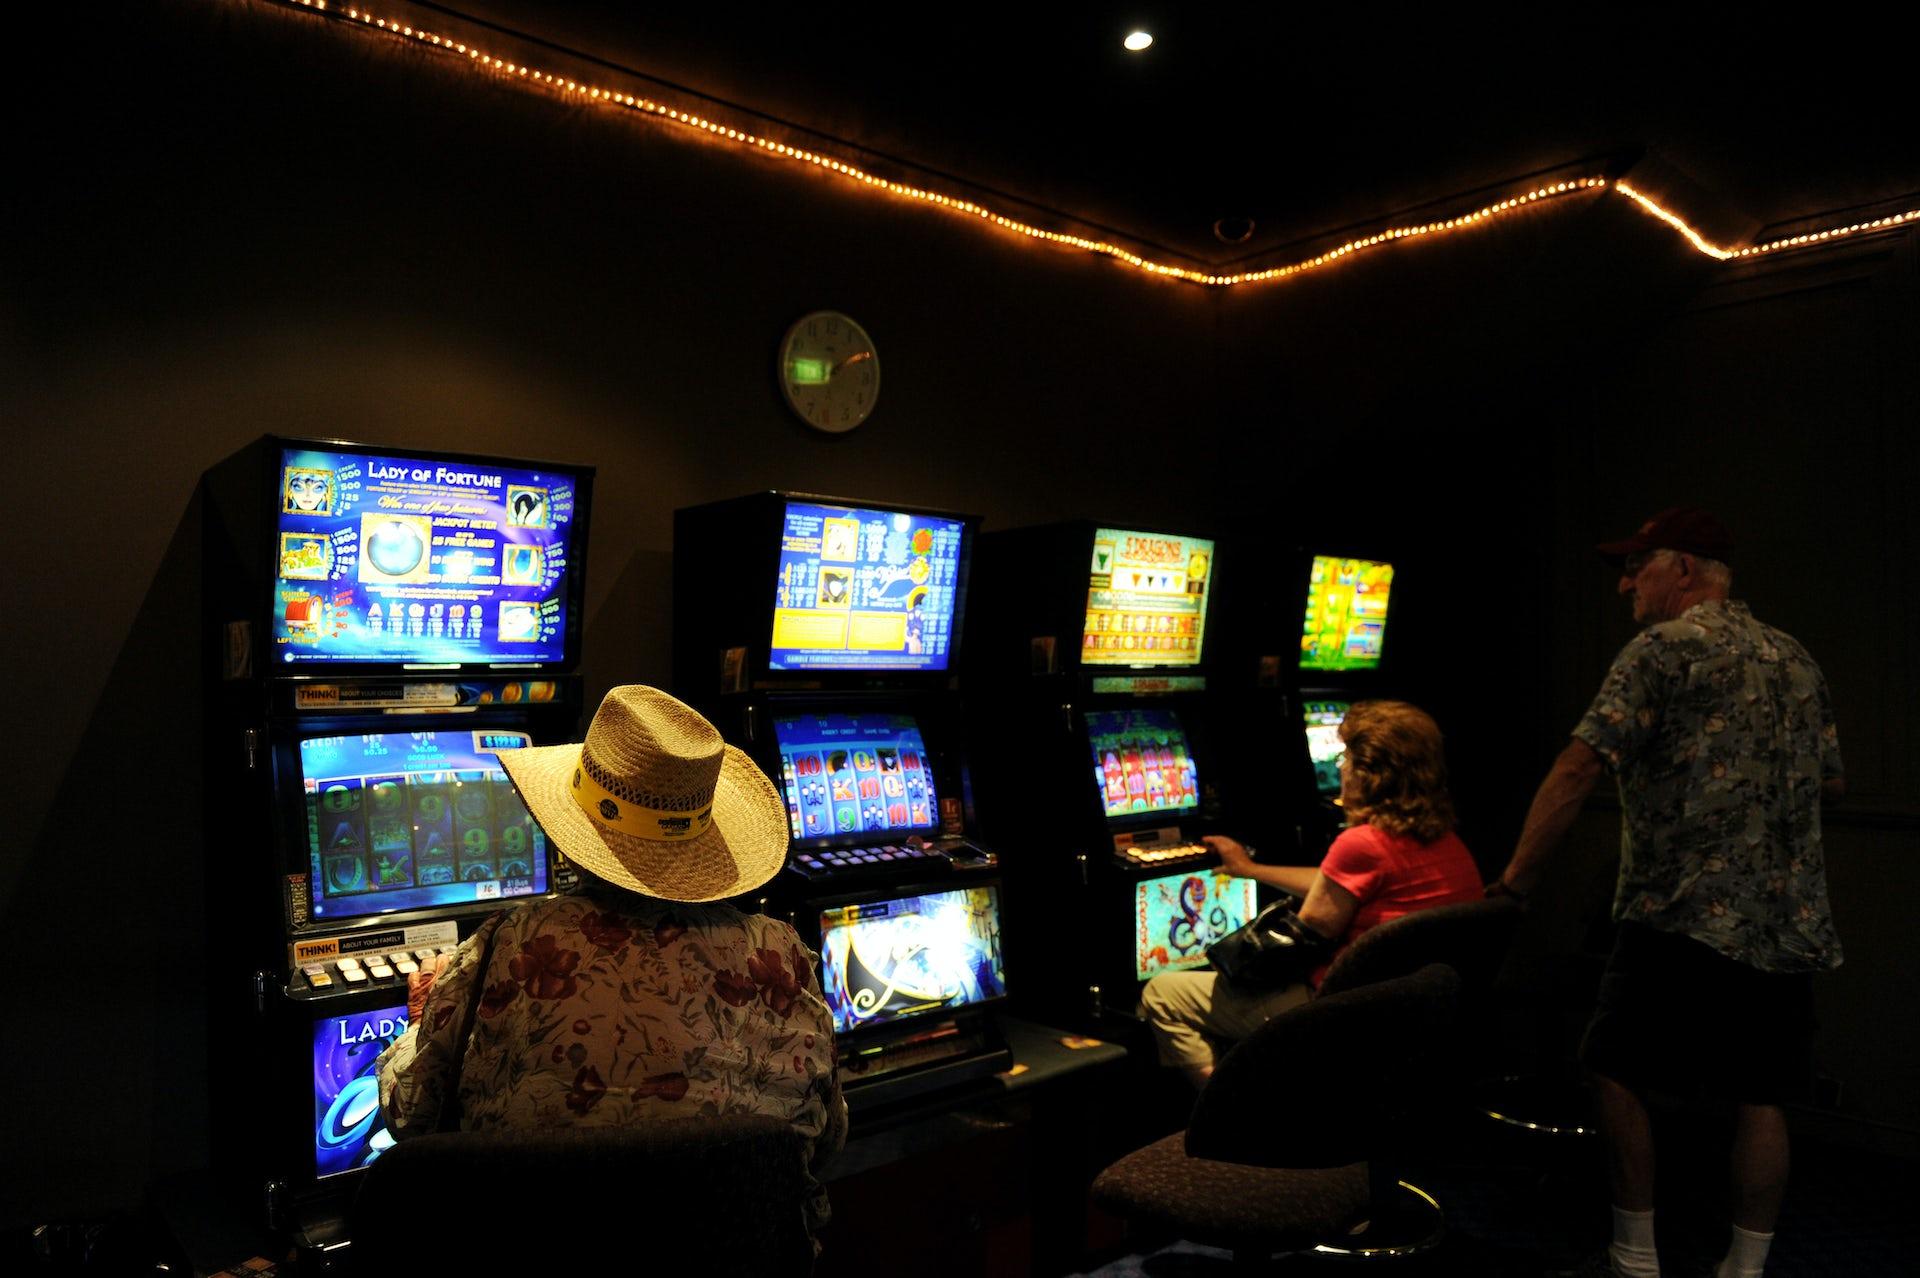 Gambling pokies addiction procter and gamble pakistan jobs 2013